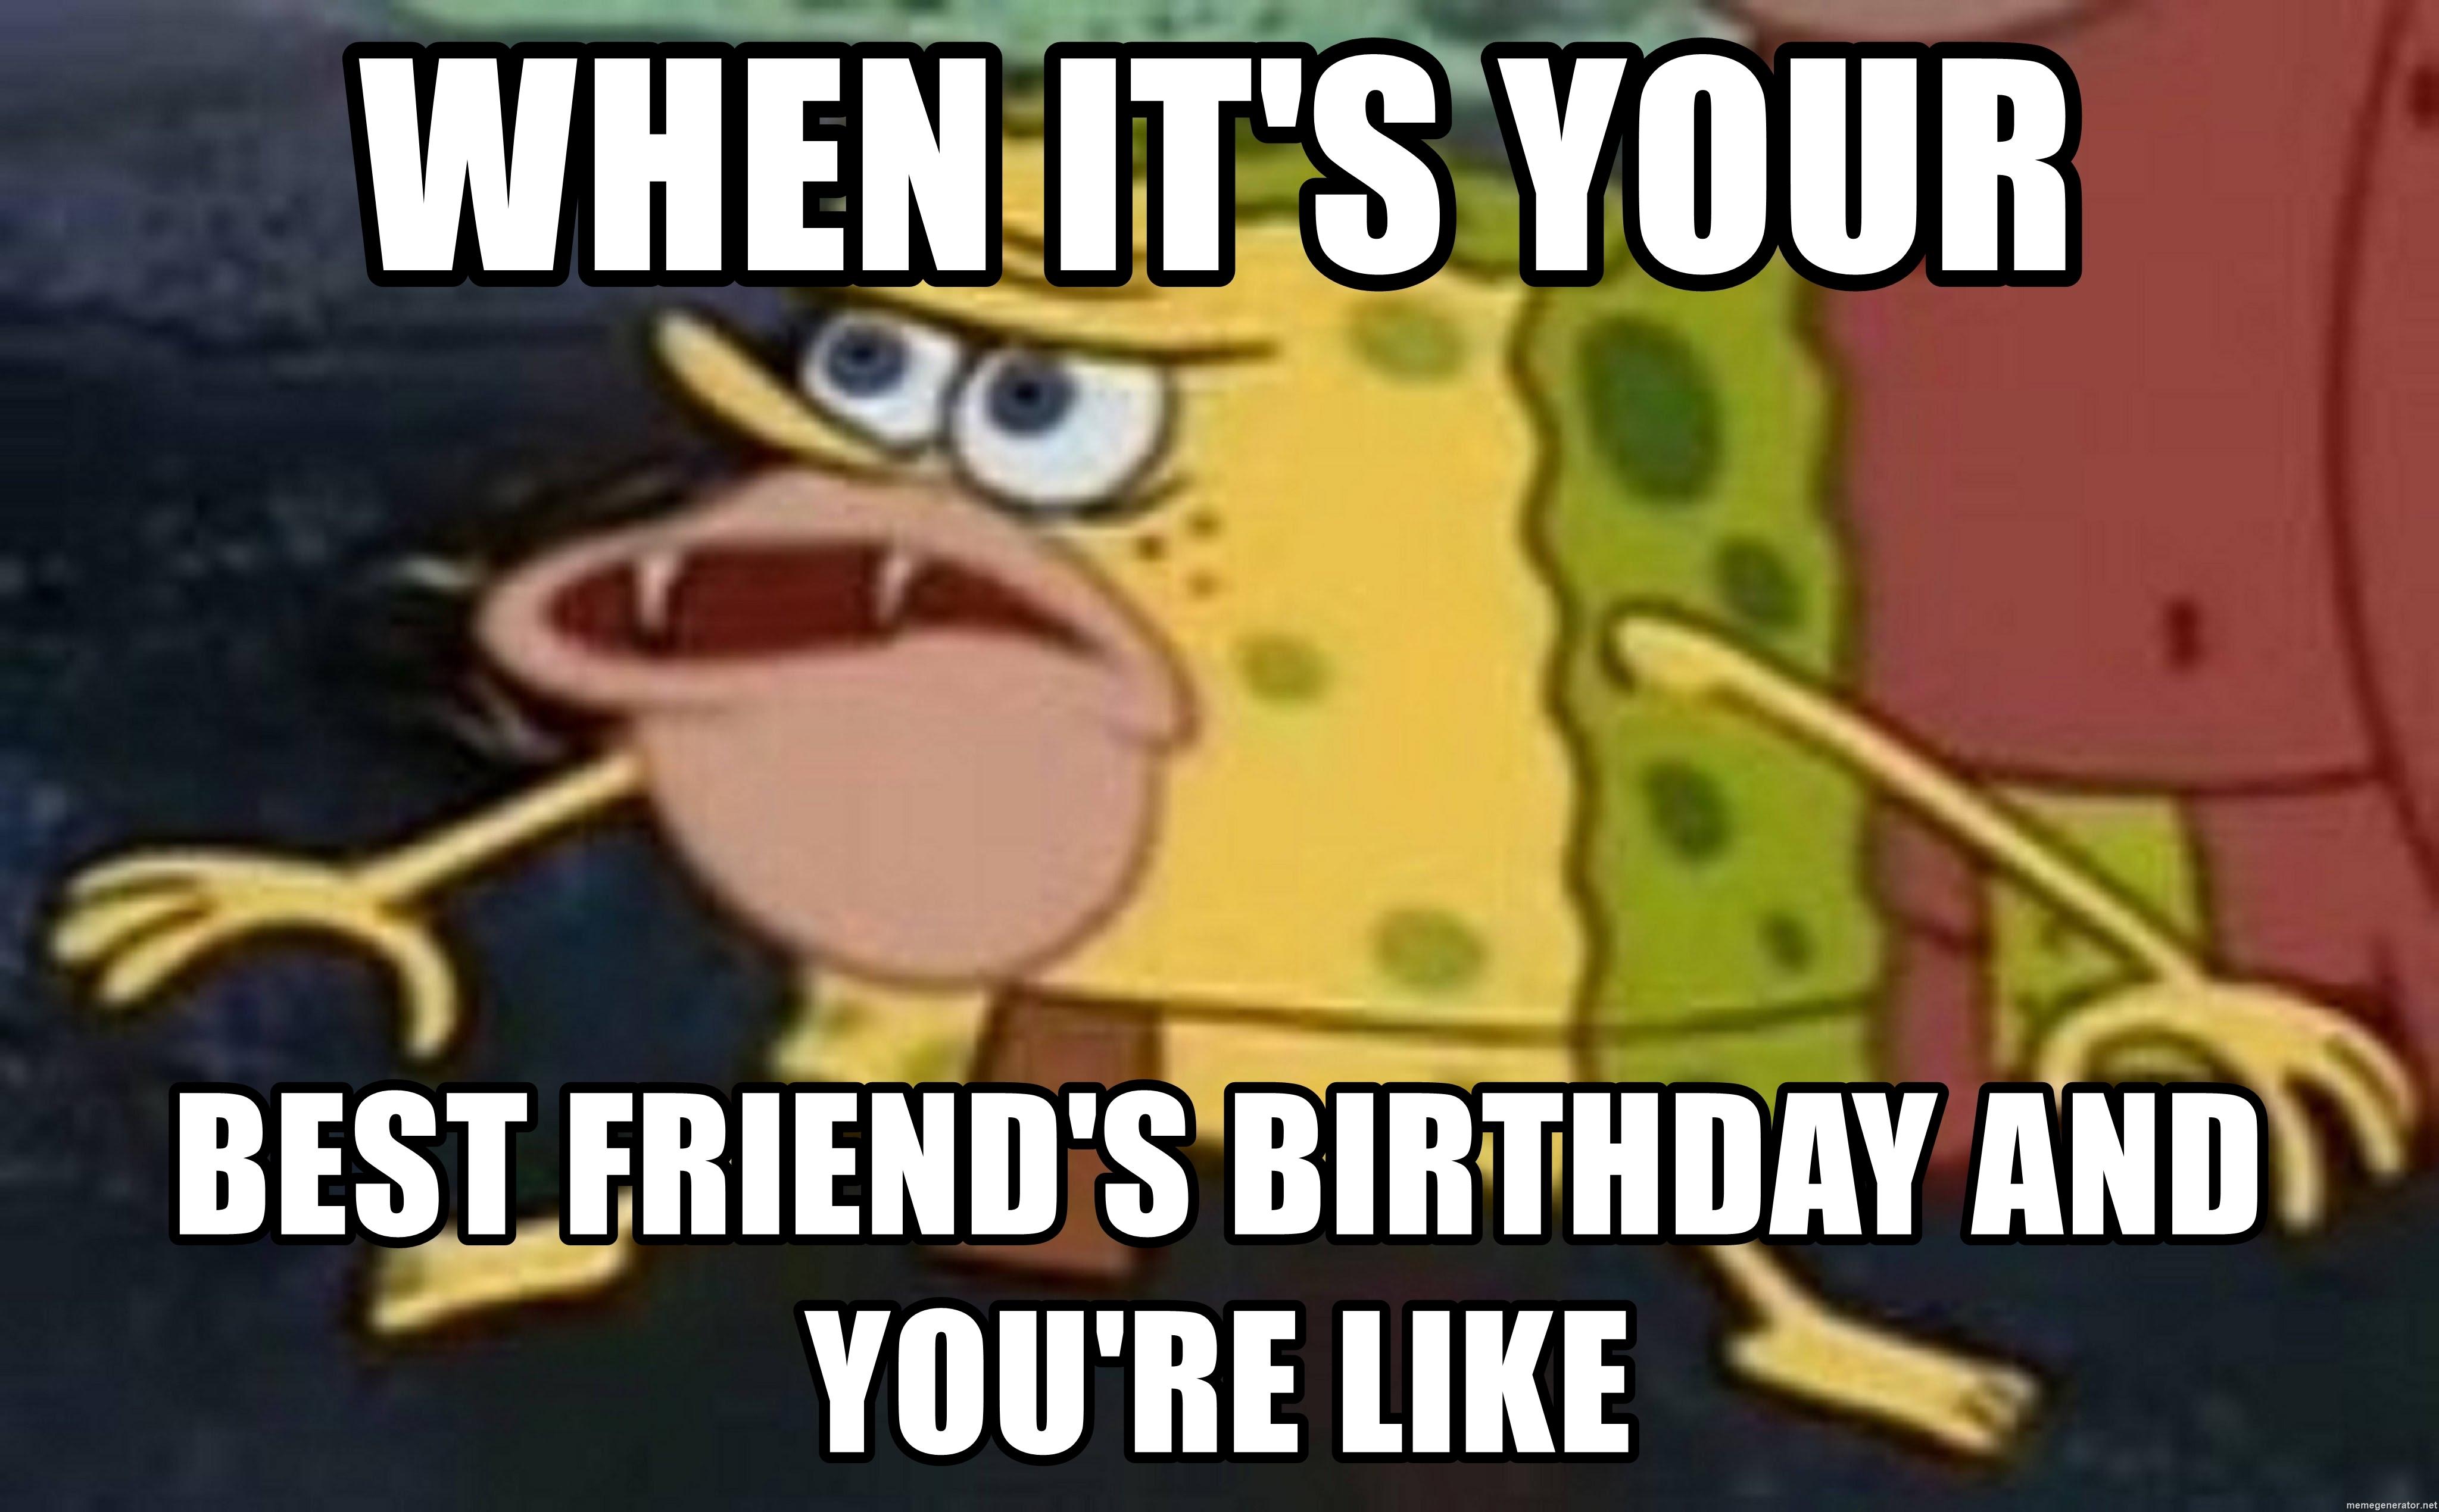 13 Perfect SpongeBob SquarePants Birthday Memes And GIFs